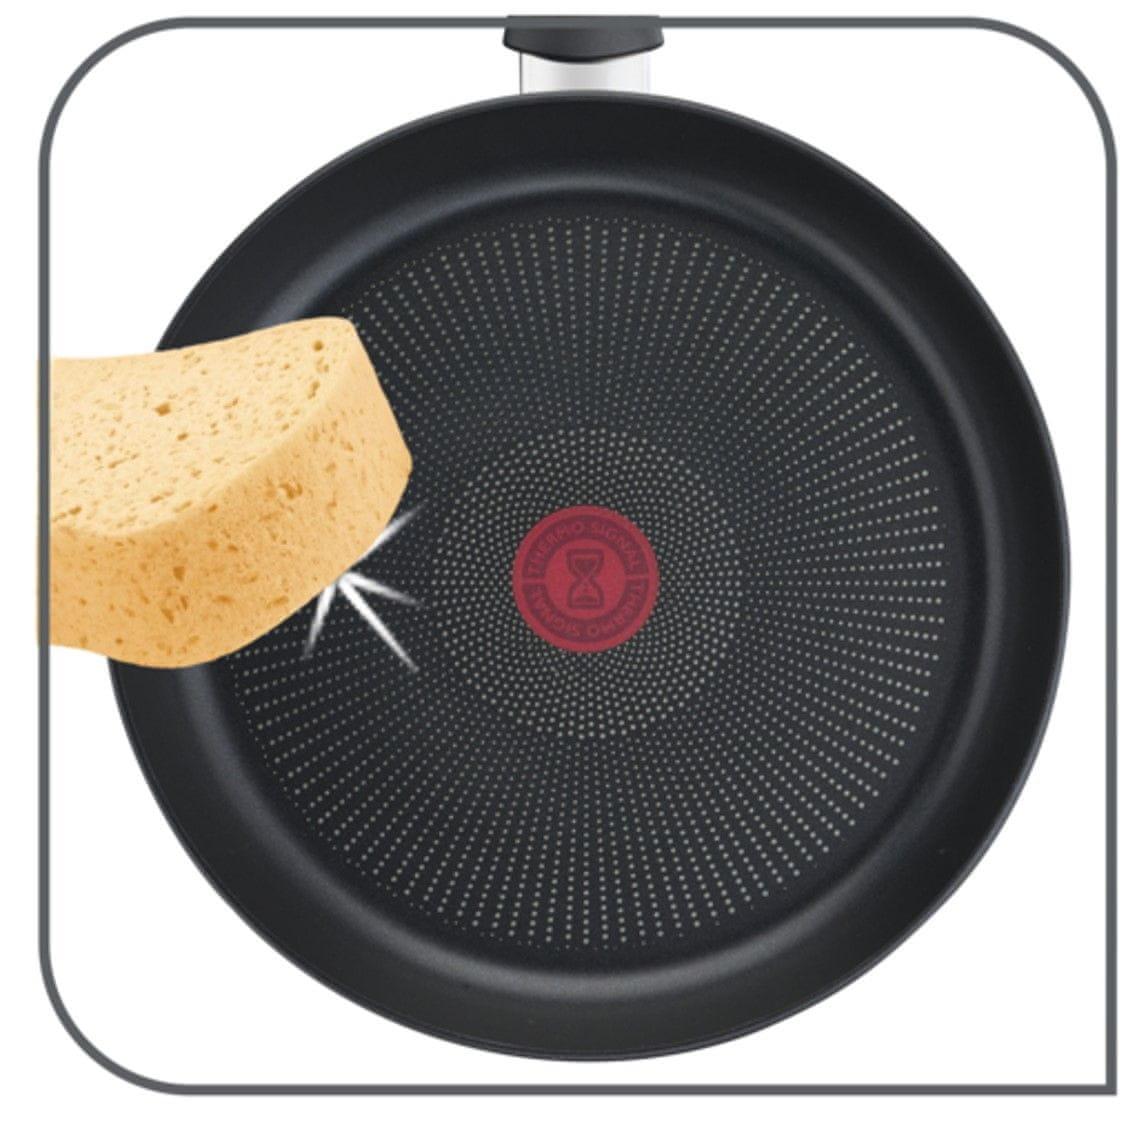 Uniwersalna patelnia Tefal Easy Chef patelnia 24 cm G2700472